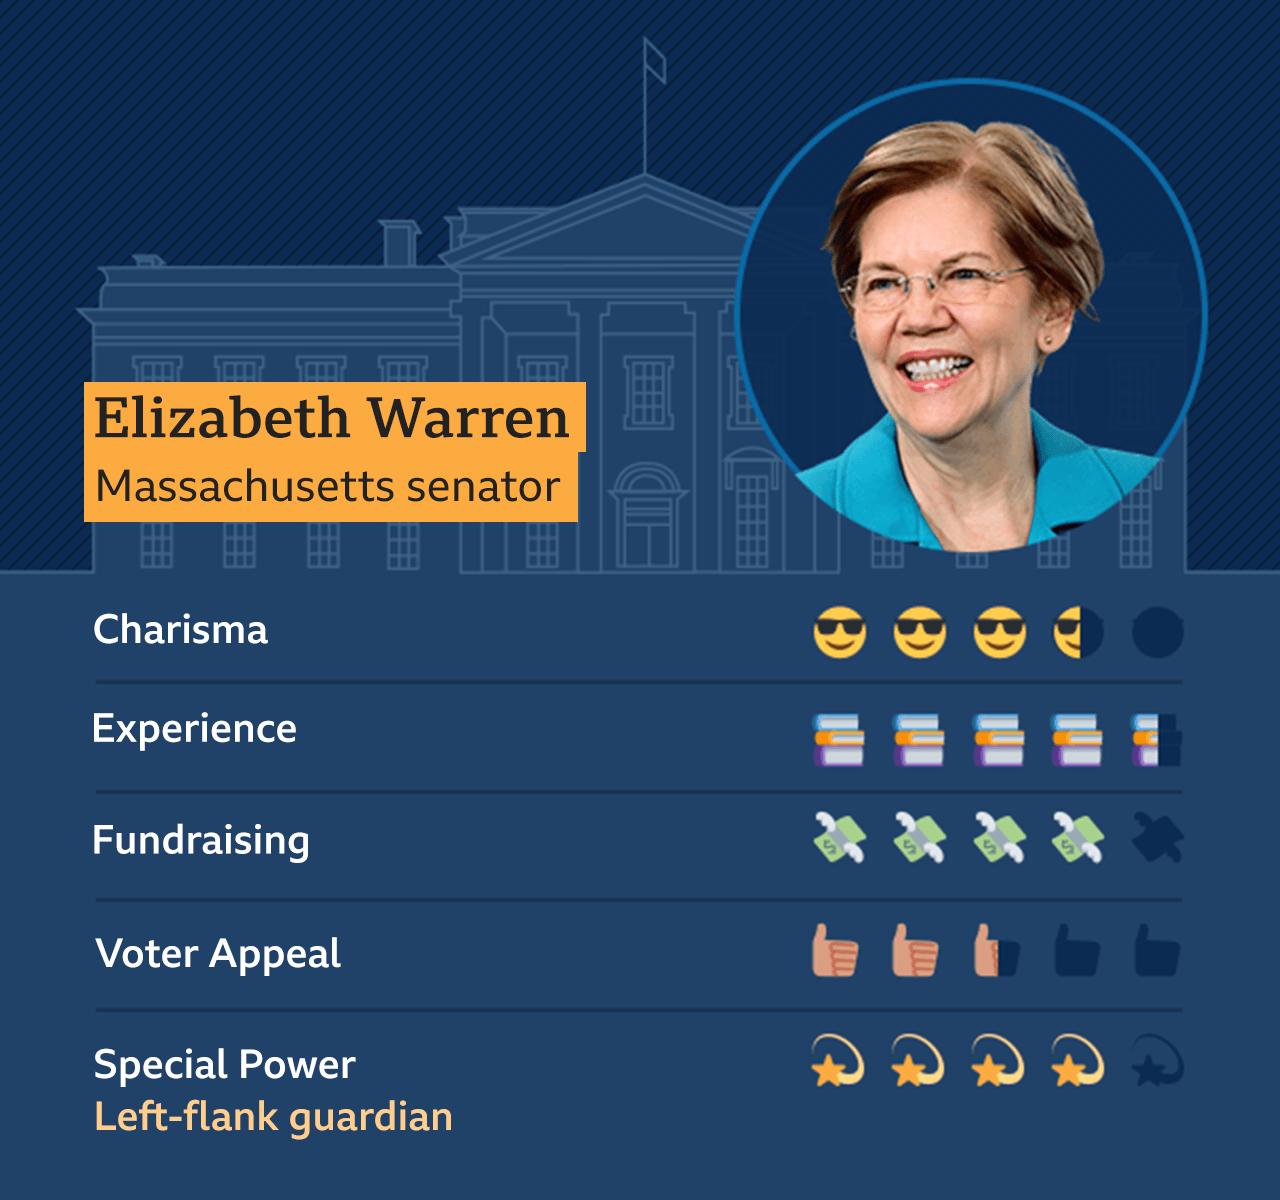 Graphic of Elizabeth Warren, Massachusetts Senator, Charisma - 3.5, Experience - 4.5, Fundraising - 4, Voter appeal - 2.5, Special Power - Left-flank guardian - 4